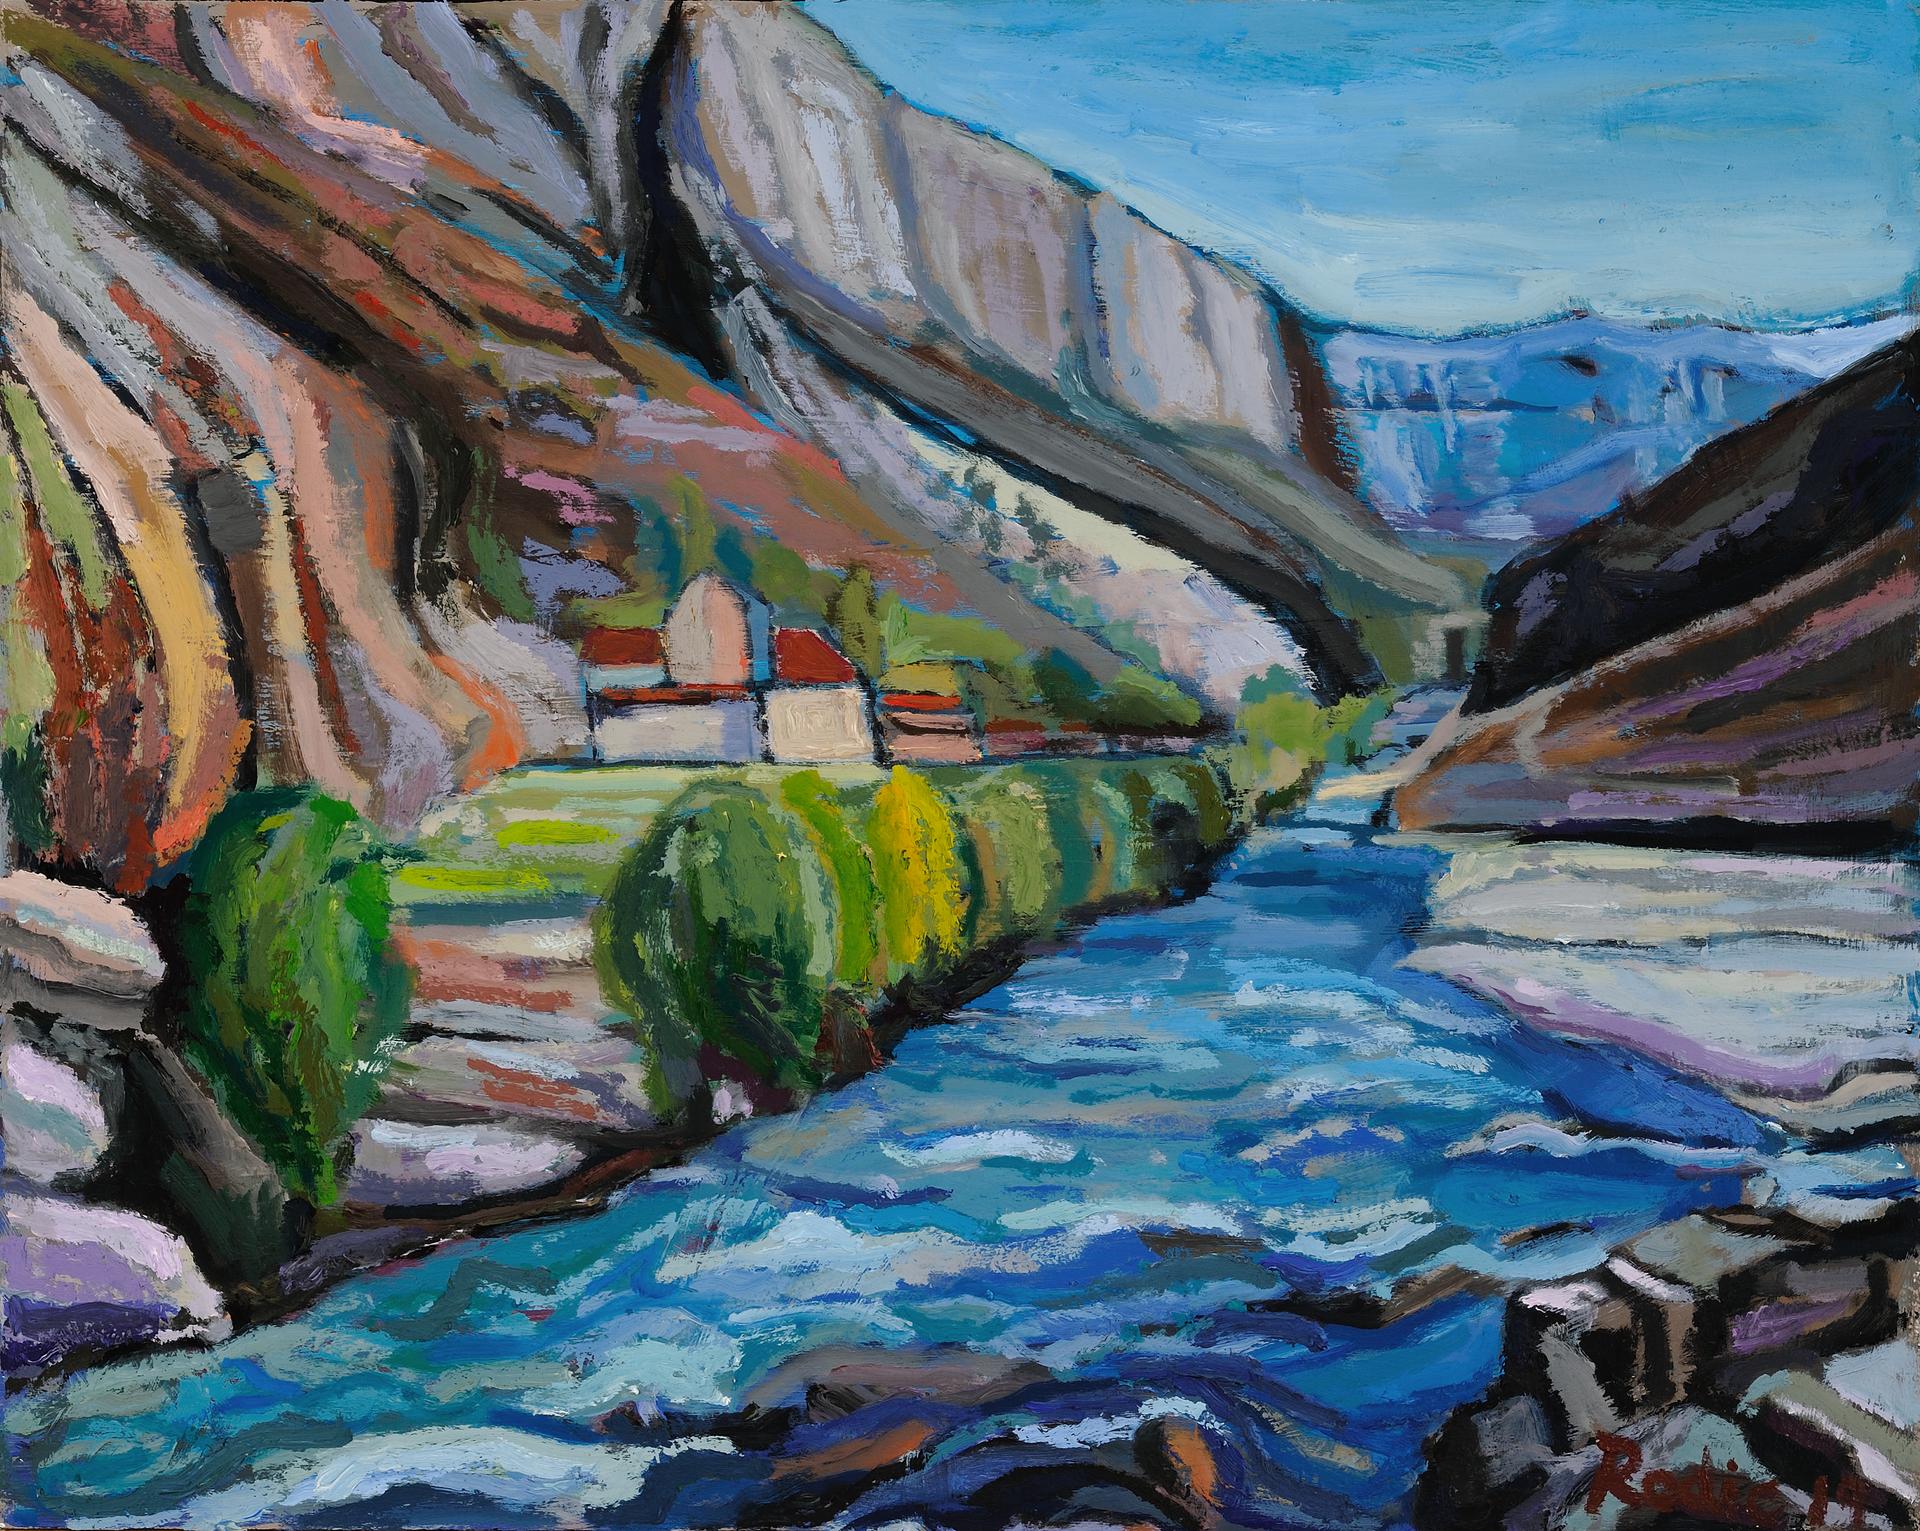 River Lim - Montenegro